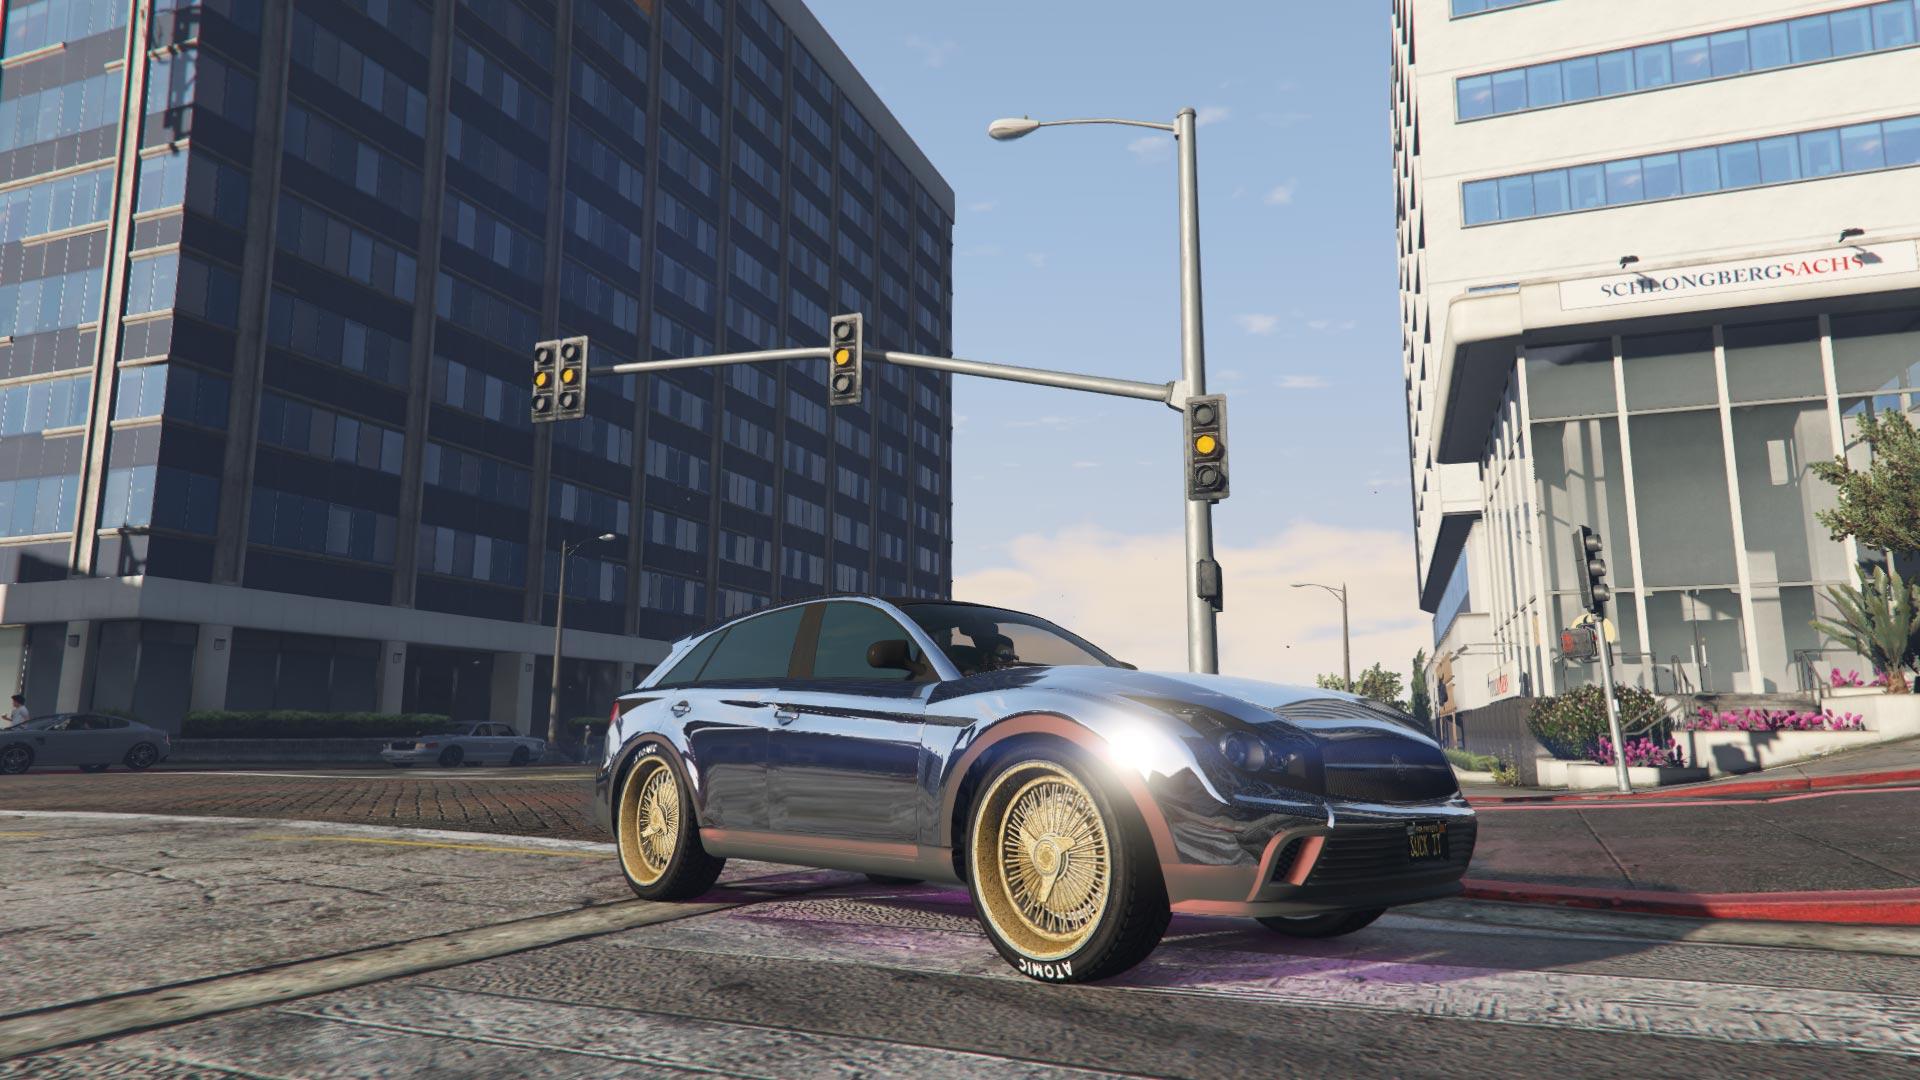 GTA5 - Grand Theft Auto V